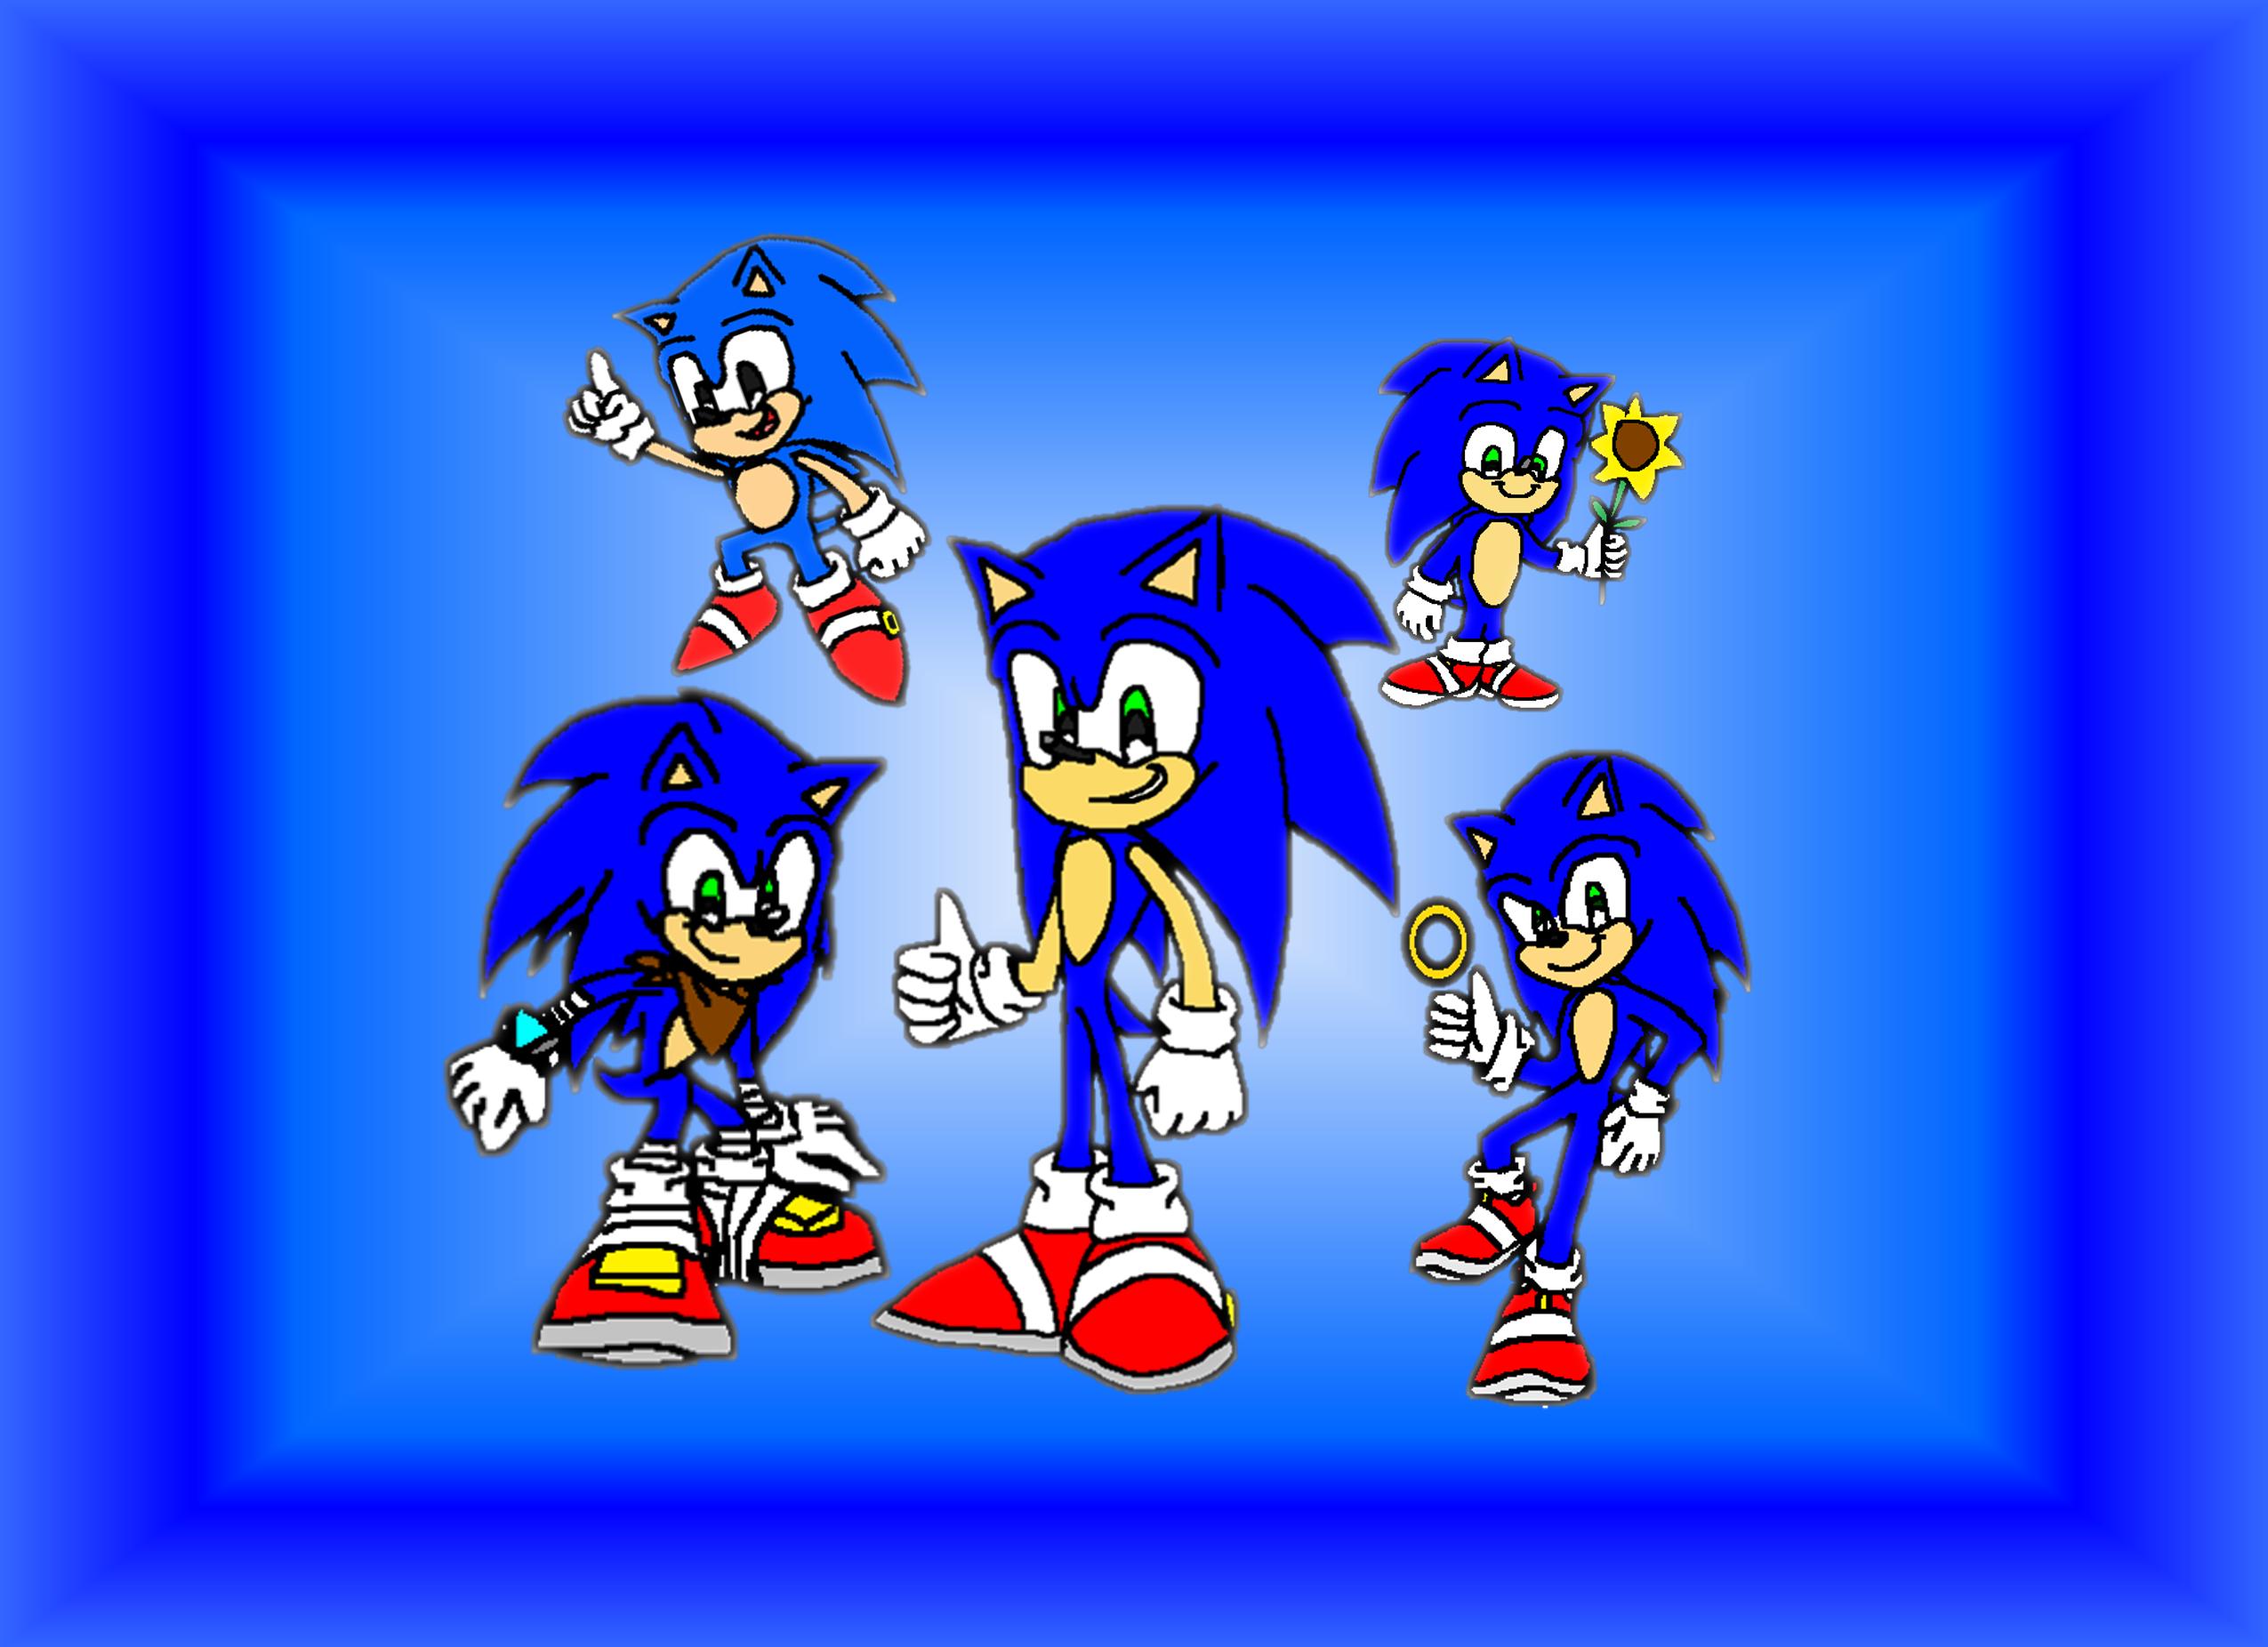 Happy Birthday Sonic The Hedgehog June 23 Sonic The Hedgehog Fan Art 43419573 Fanpop